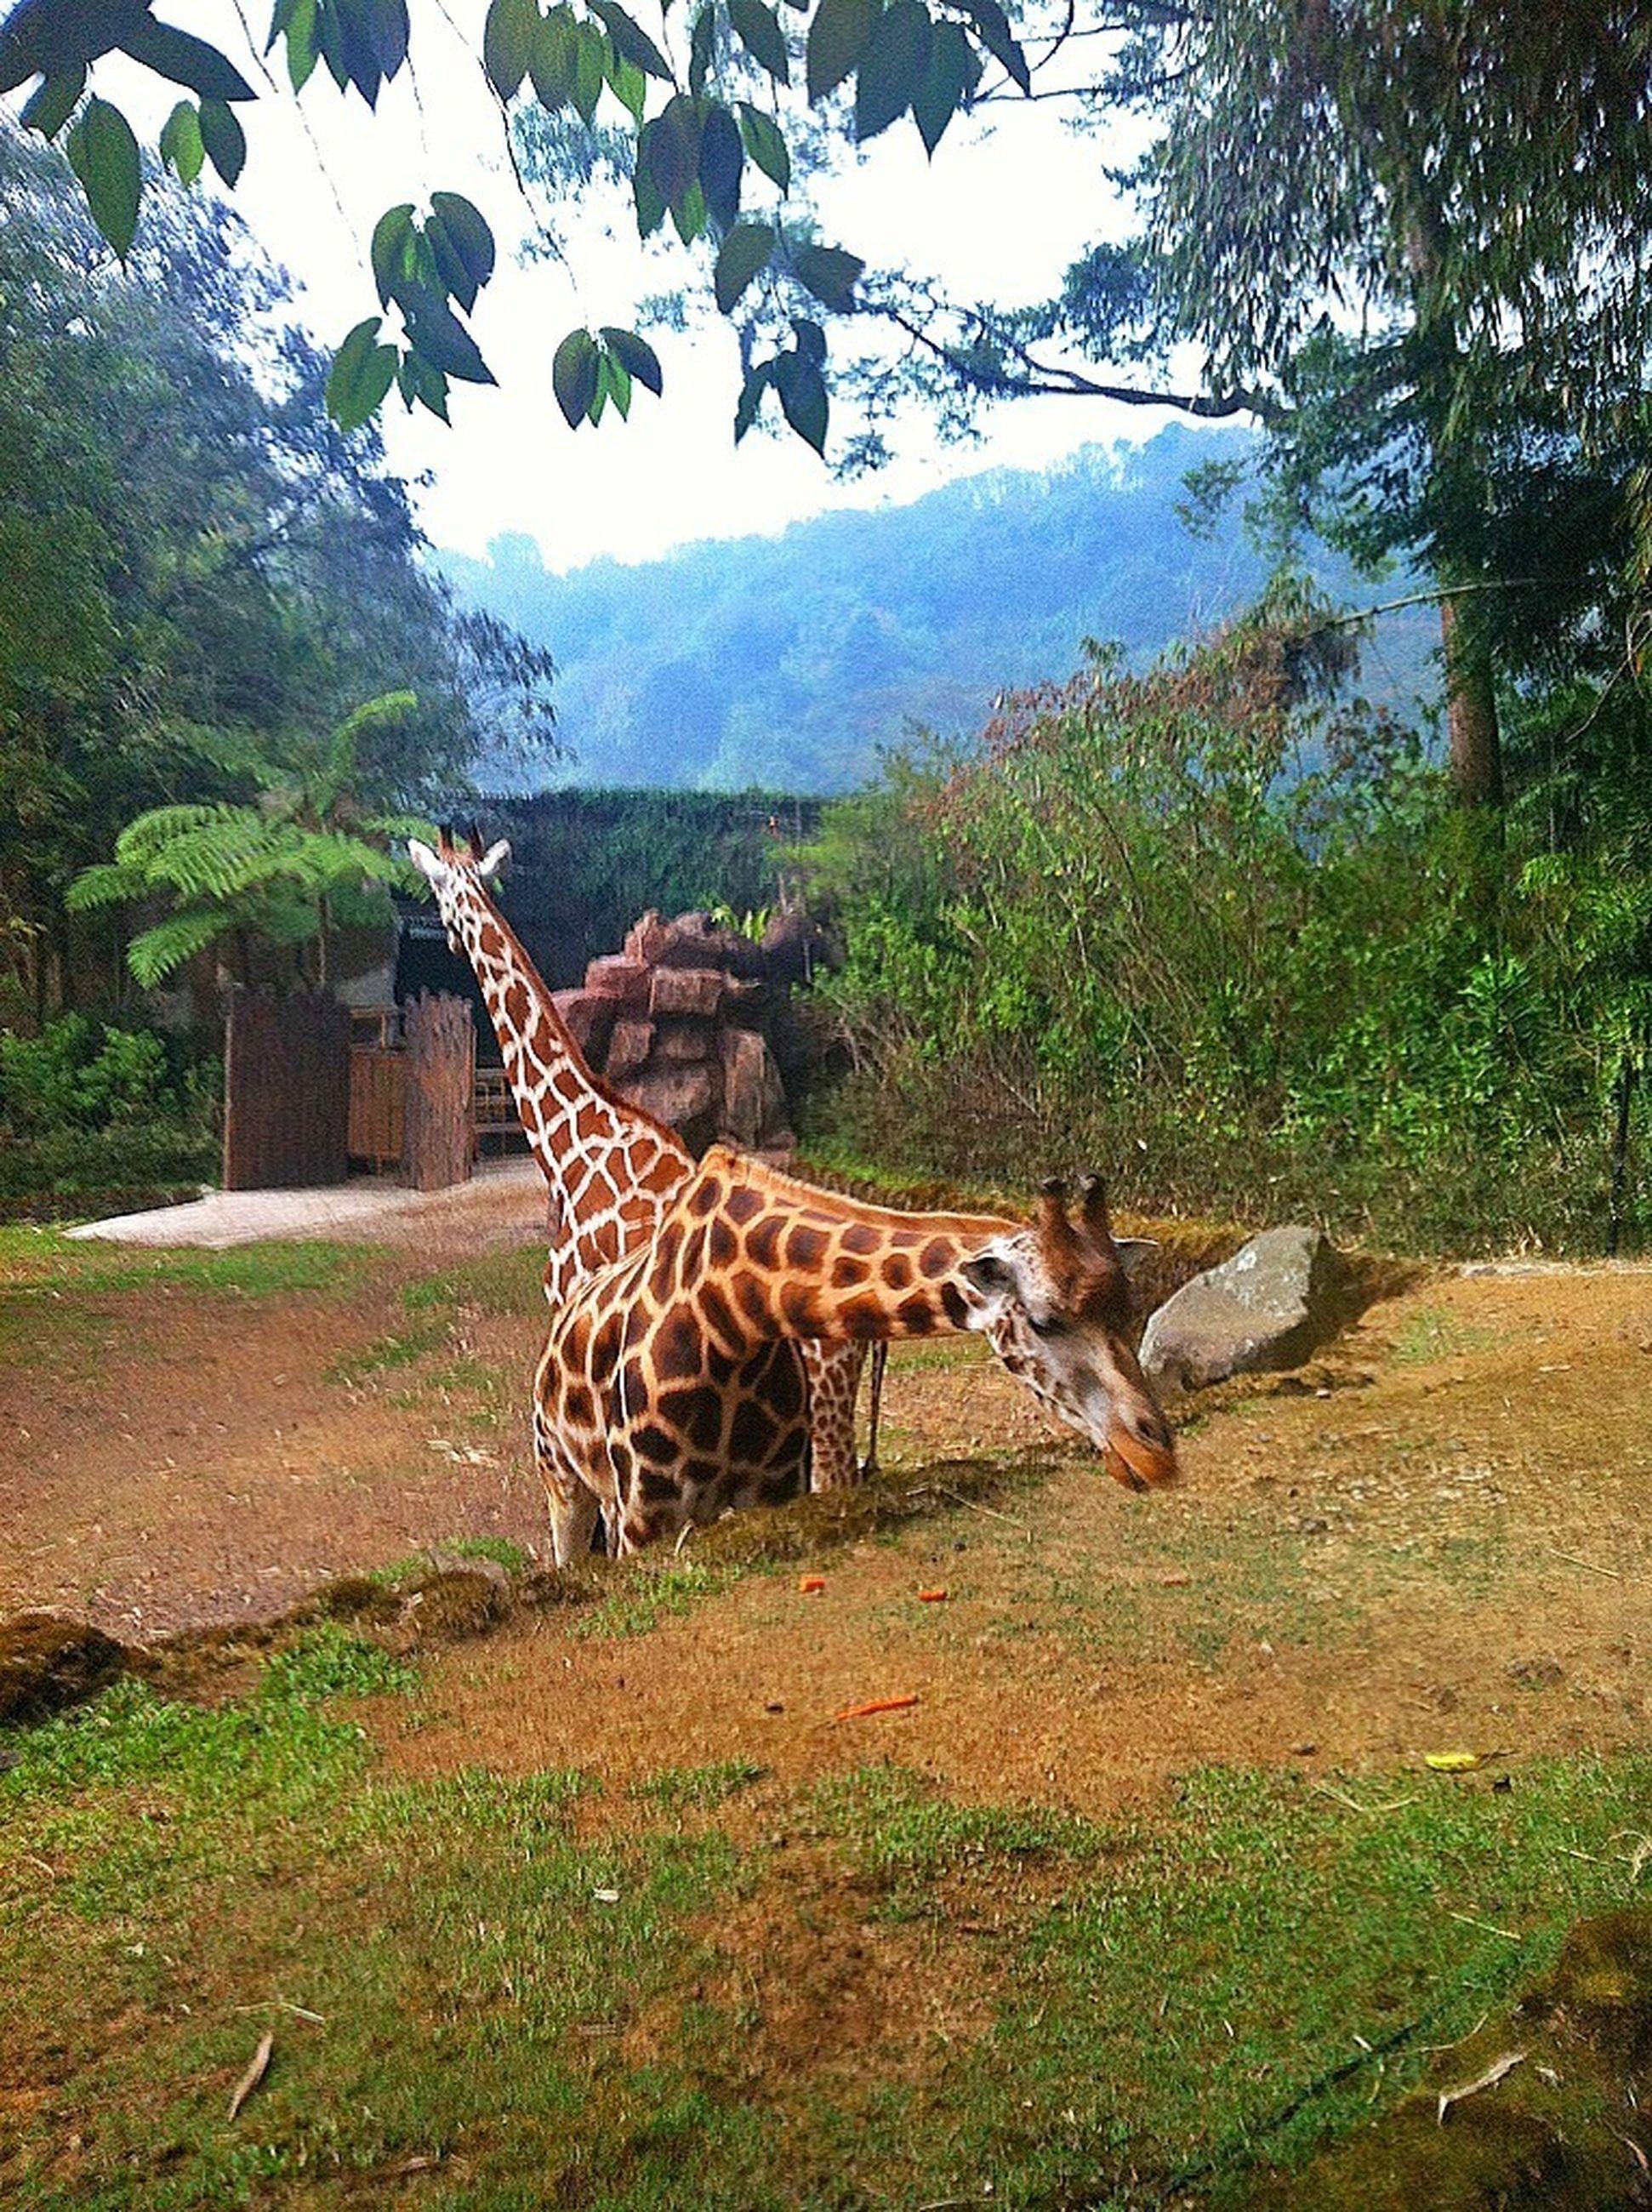 animal themes, mammal, one animal, herbivorous, safari animals, tree, animals in the wild, domestic animals, wildlife, giraffe, grass, animal markings, field, standing, side view, two animals, grazing, zoology, relaxation, nature